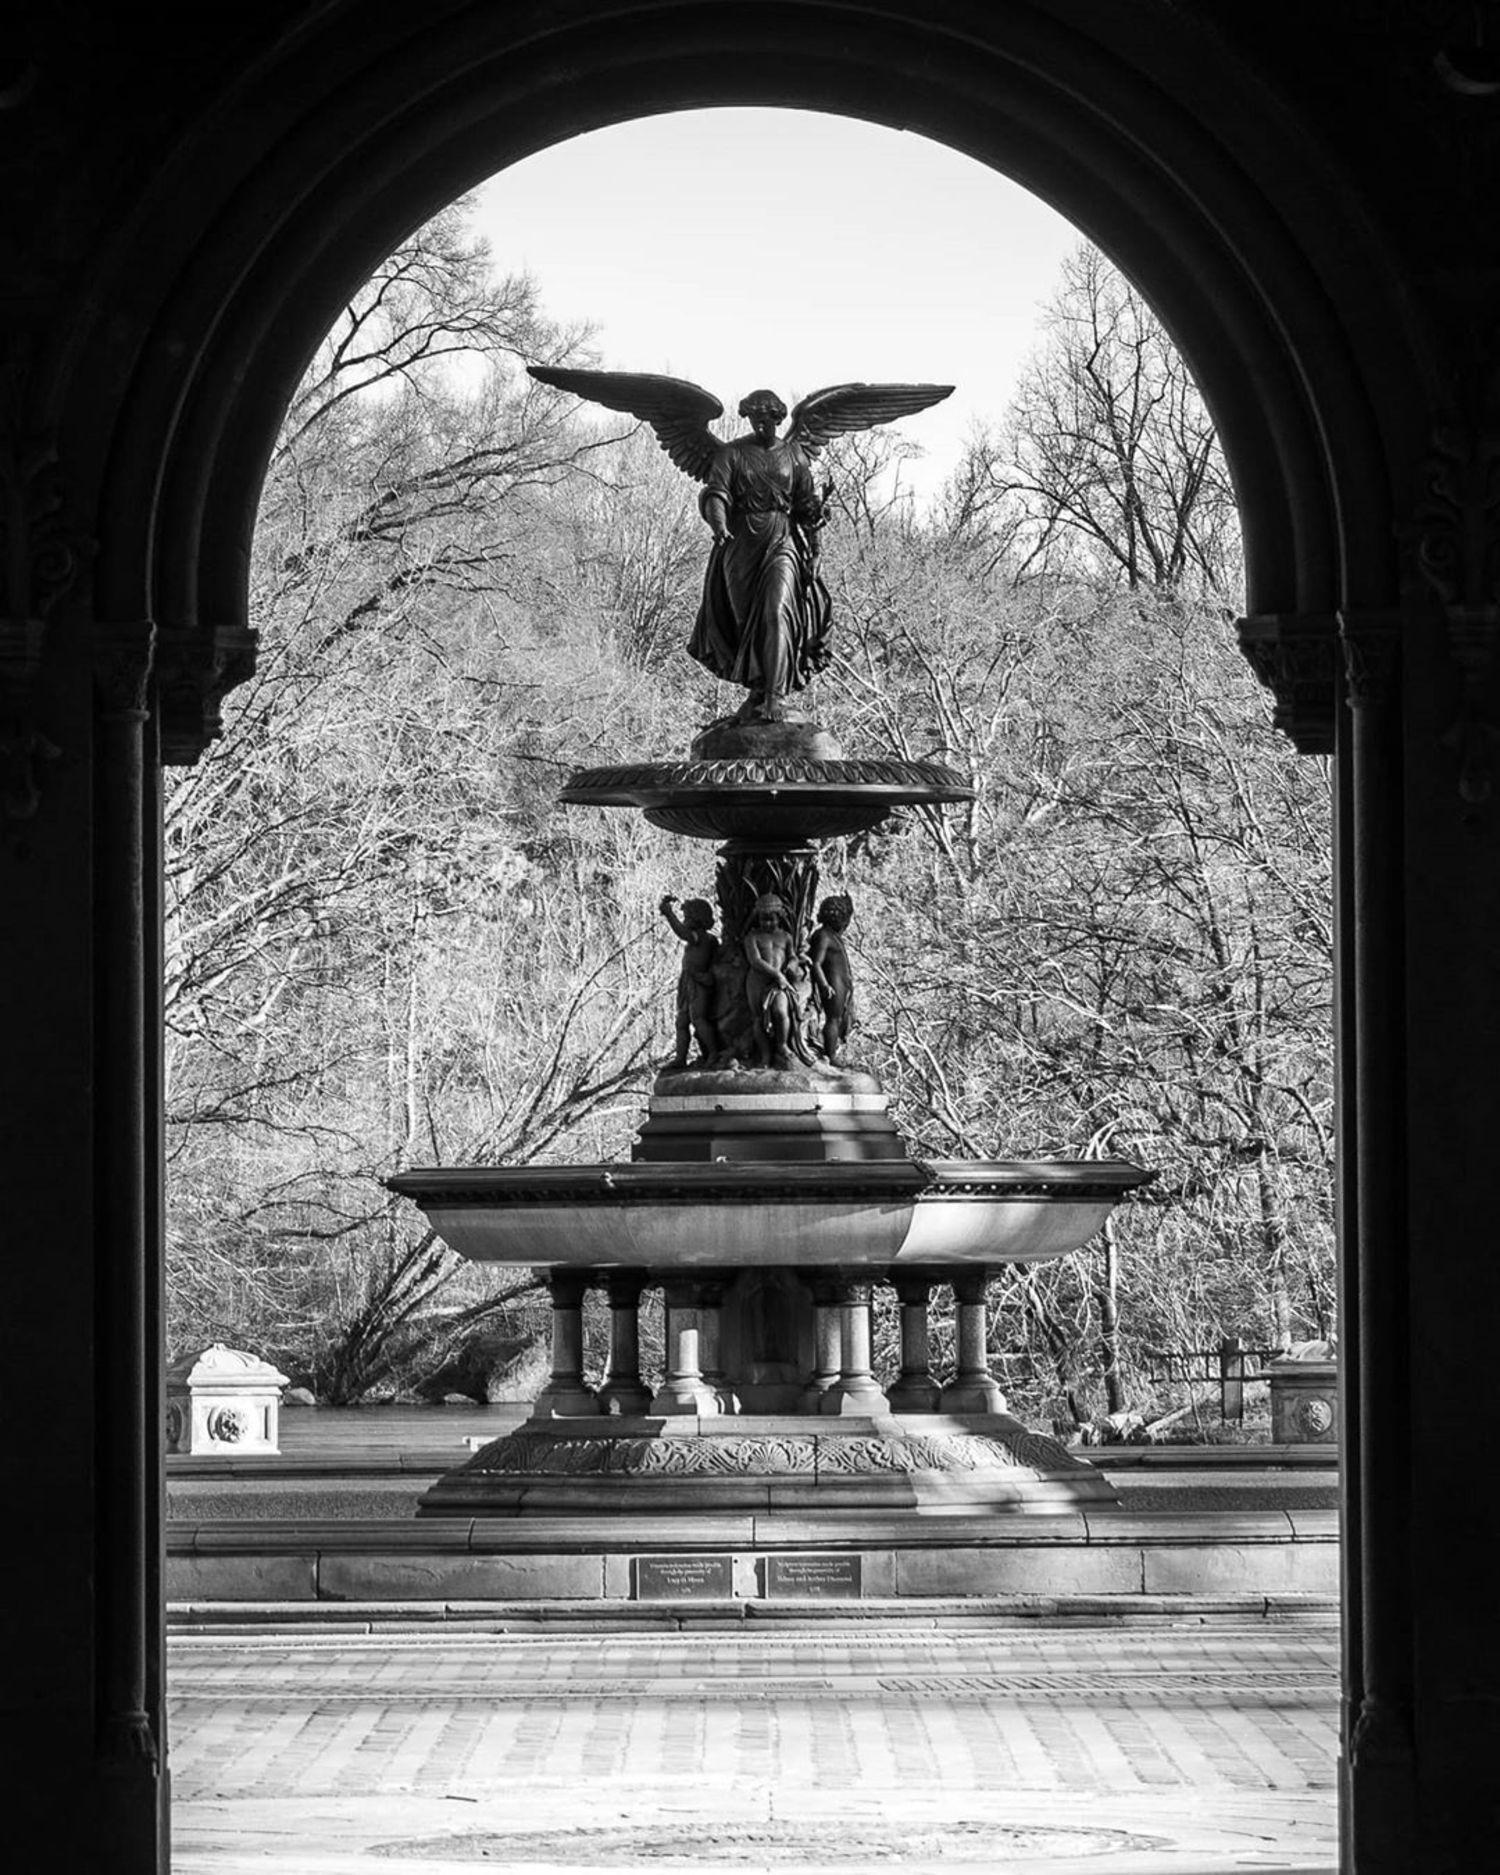 Bethesda Terrace and Fountain, Central Park, New York